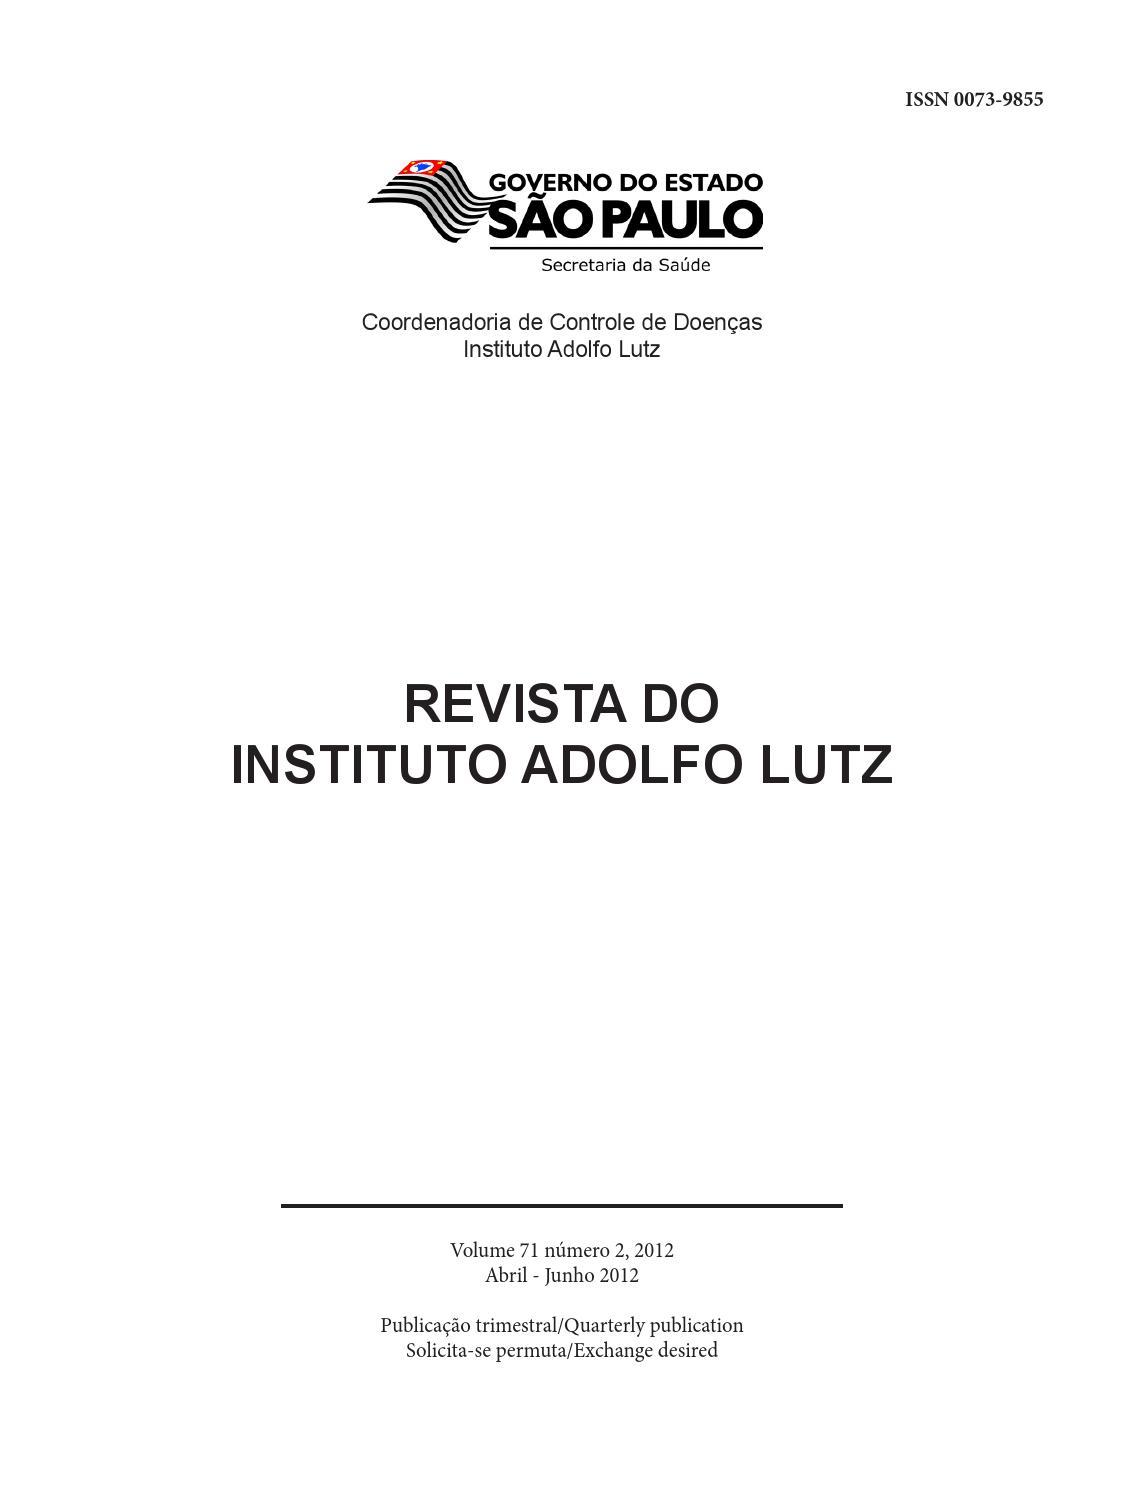 Rial 71 2 2012 by Núcleo Informação - issuu a4bc64d946